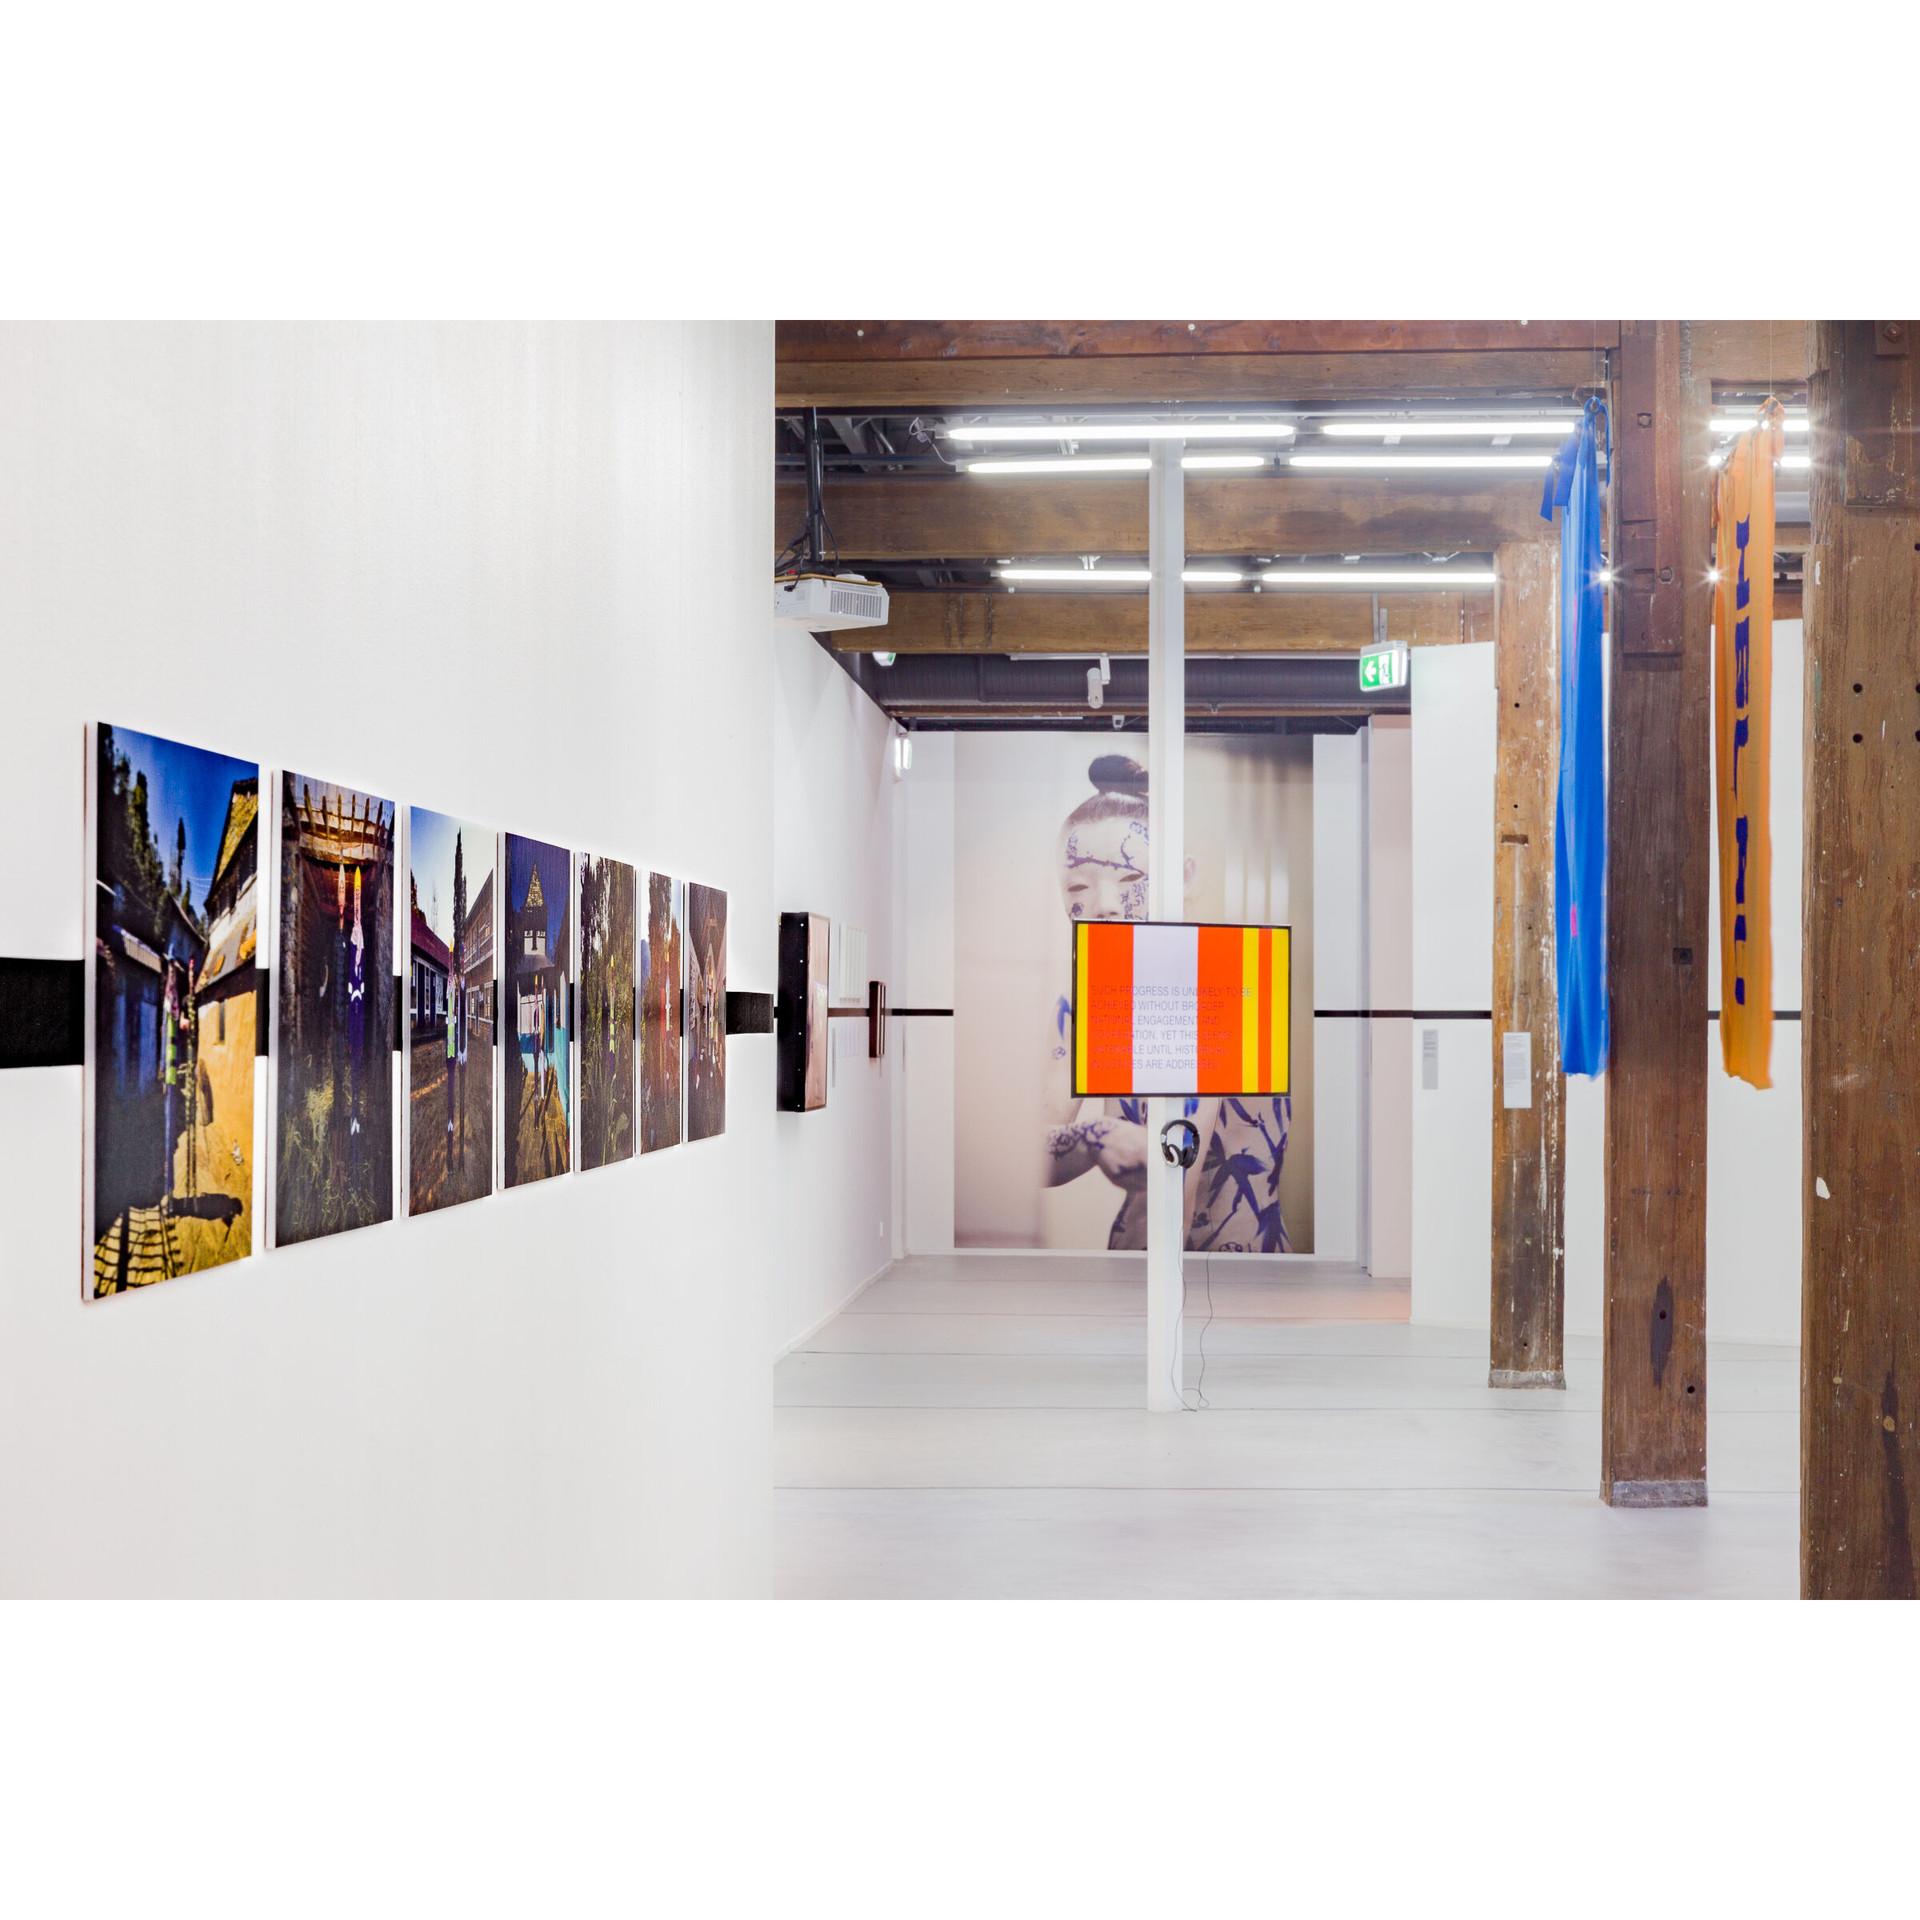 52-Artists-instagram-20190517-7151.jpg